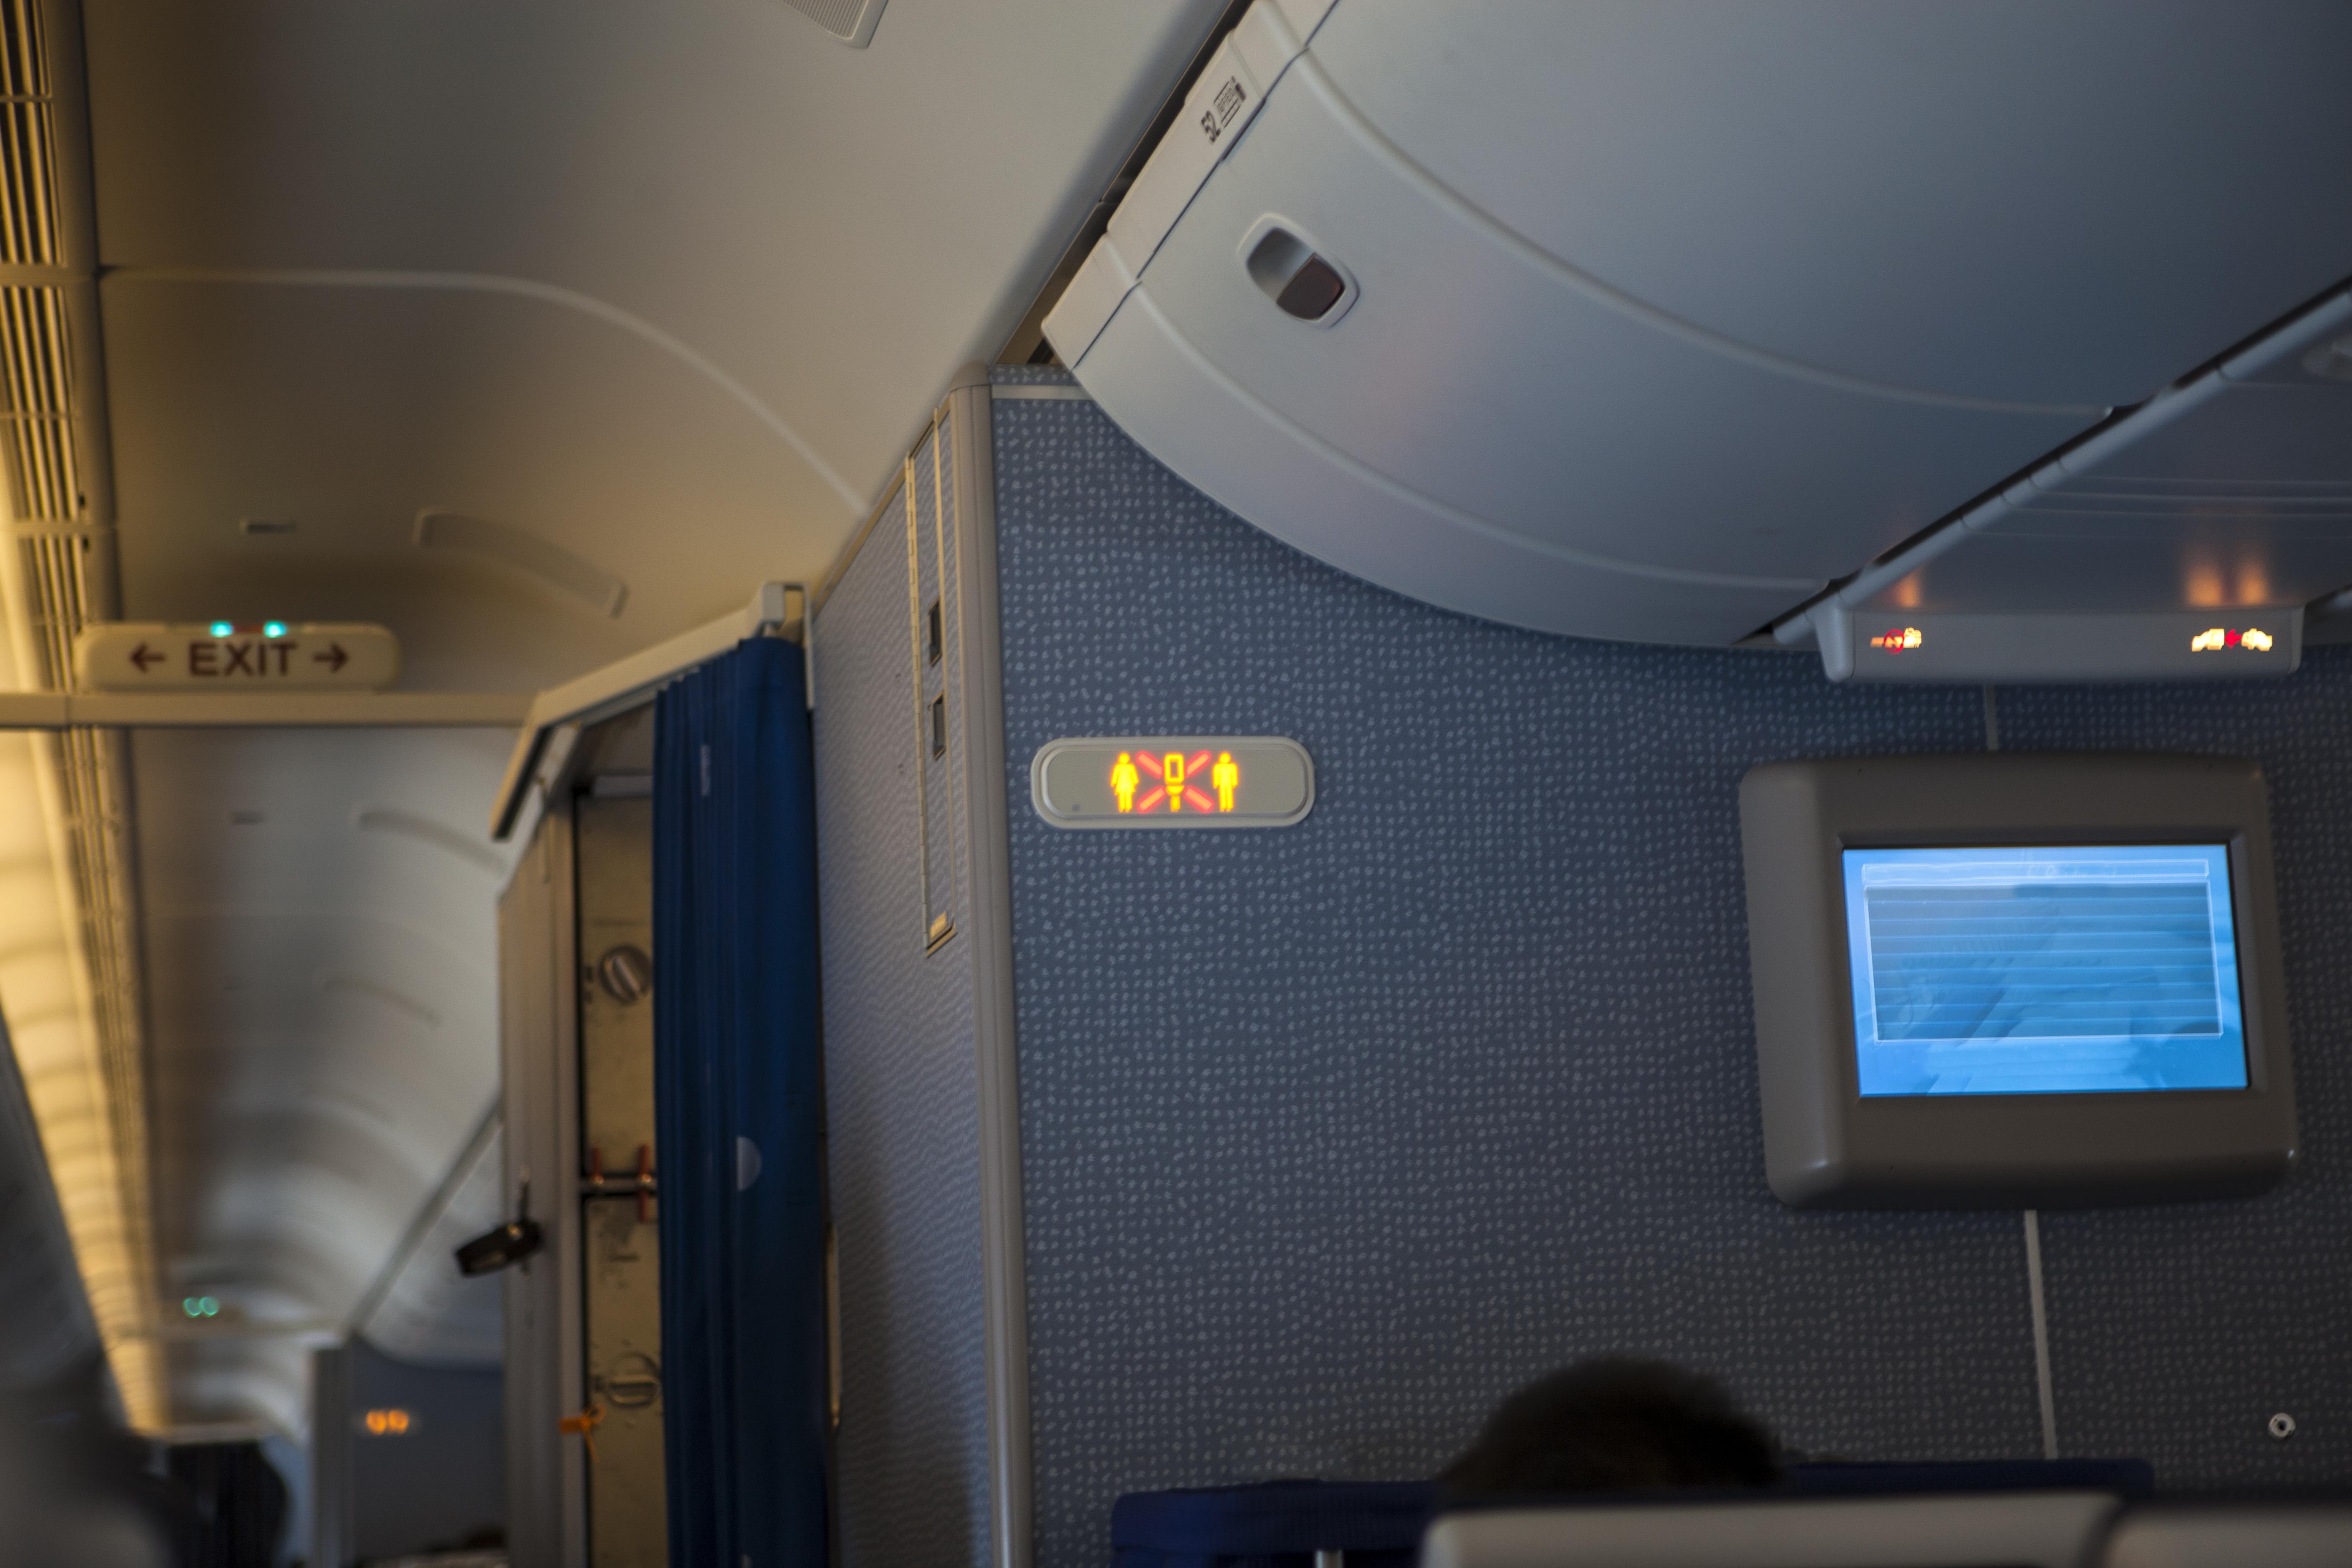 Interior of plane